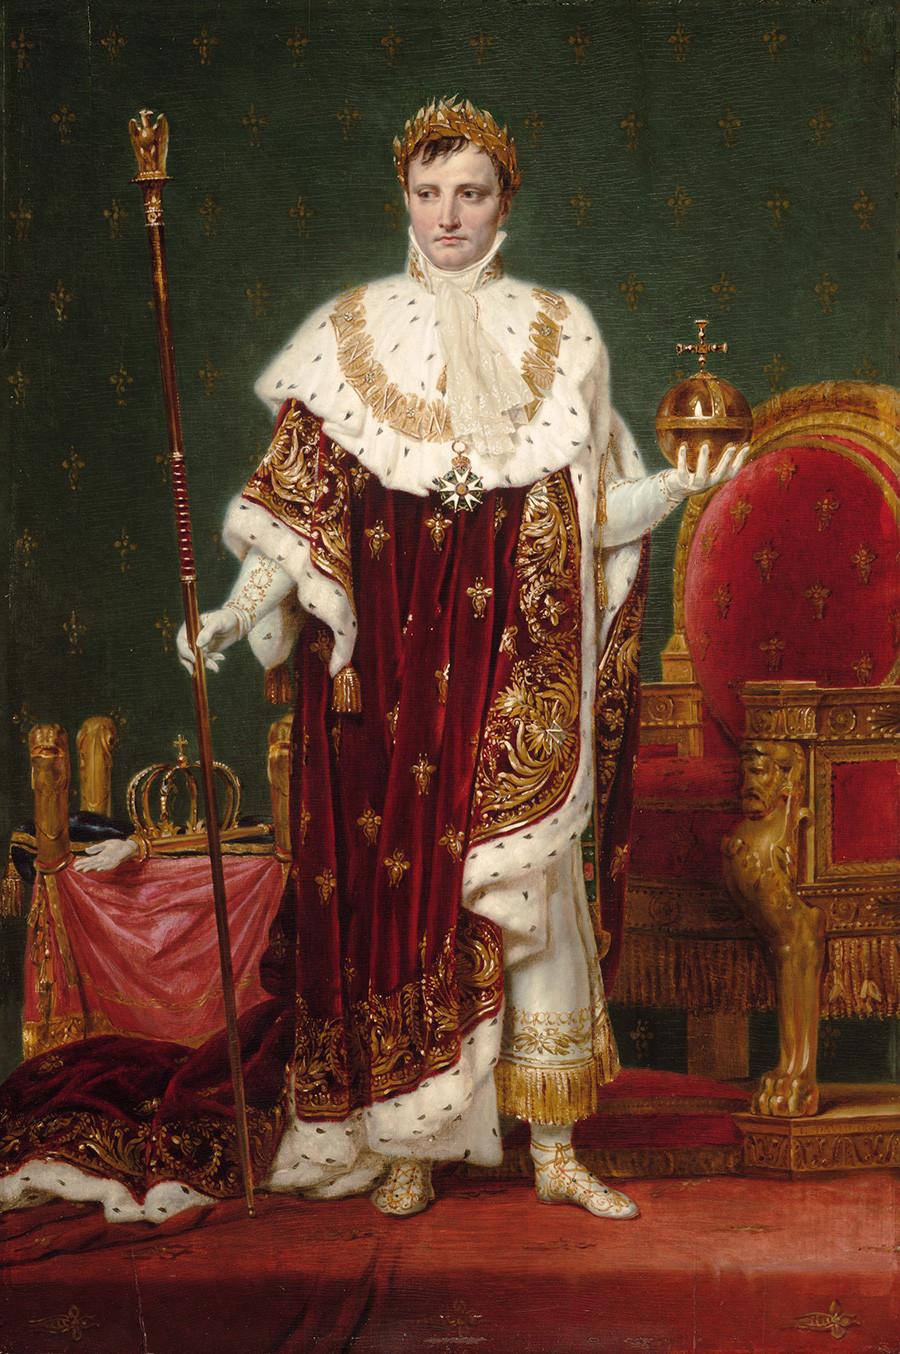 Император Наполеон I (1769-1821), Жак-Луи Давид, 1807 г.